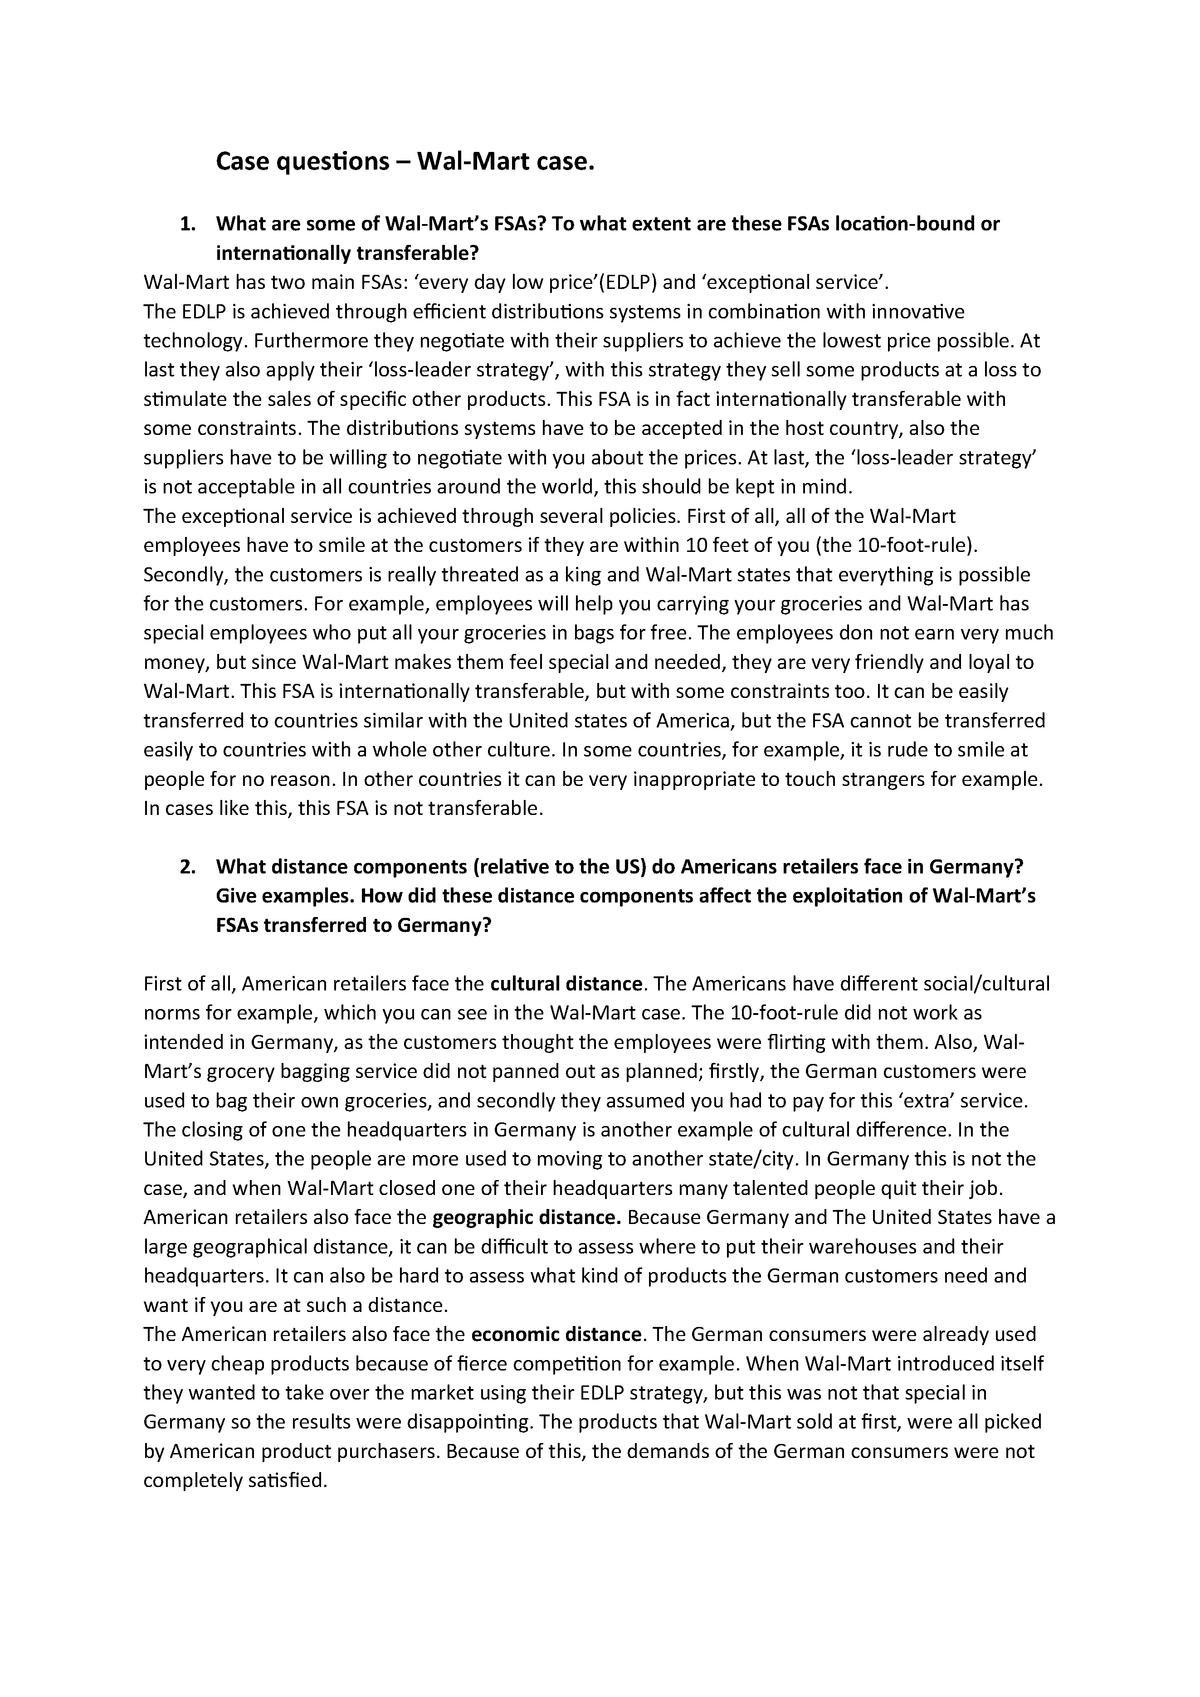 Walmart Case - EBP003A05: Introduction to International